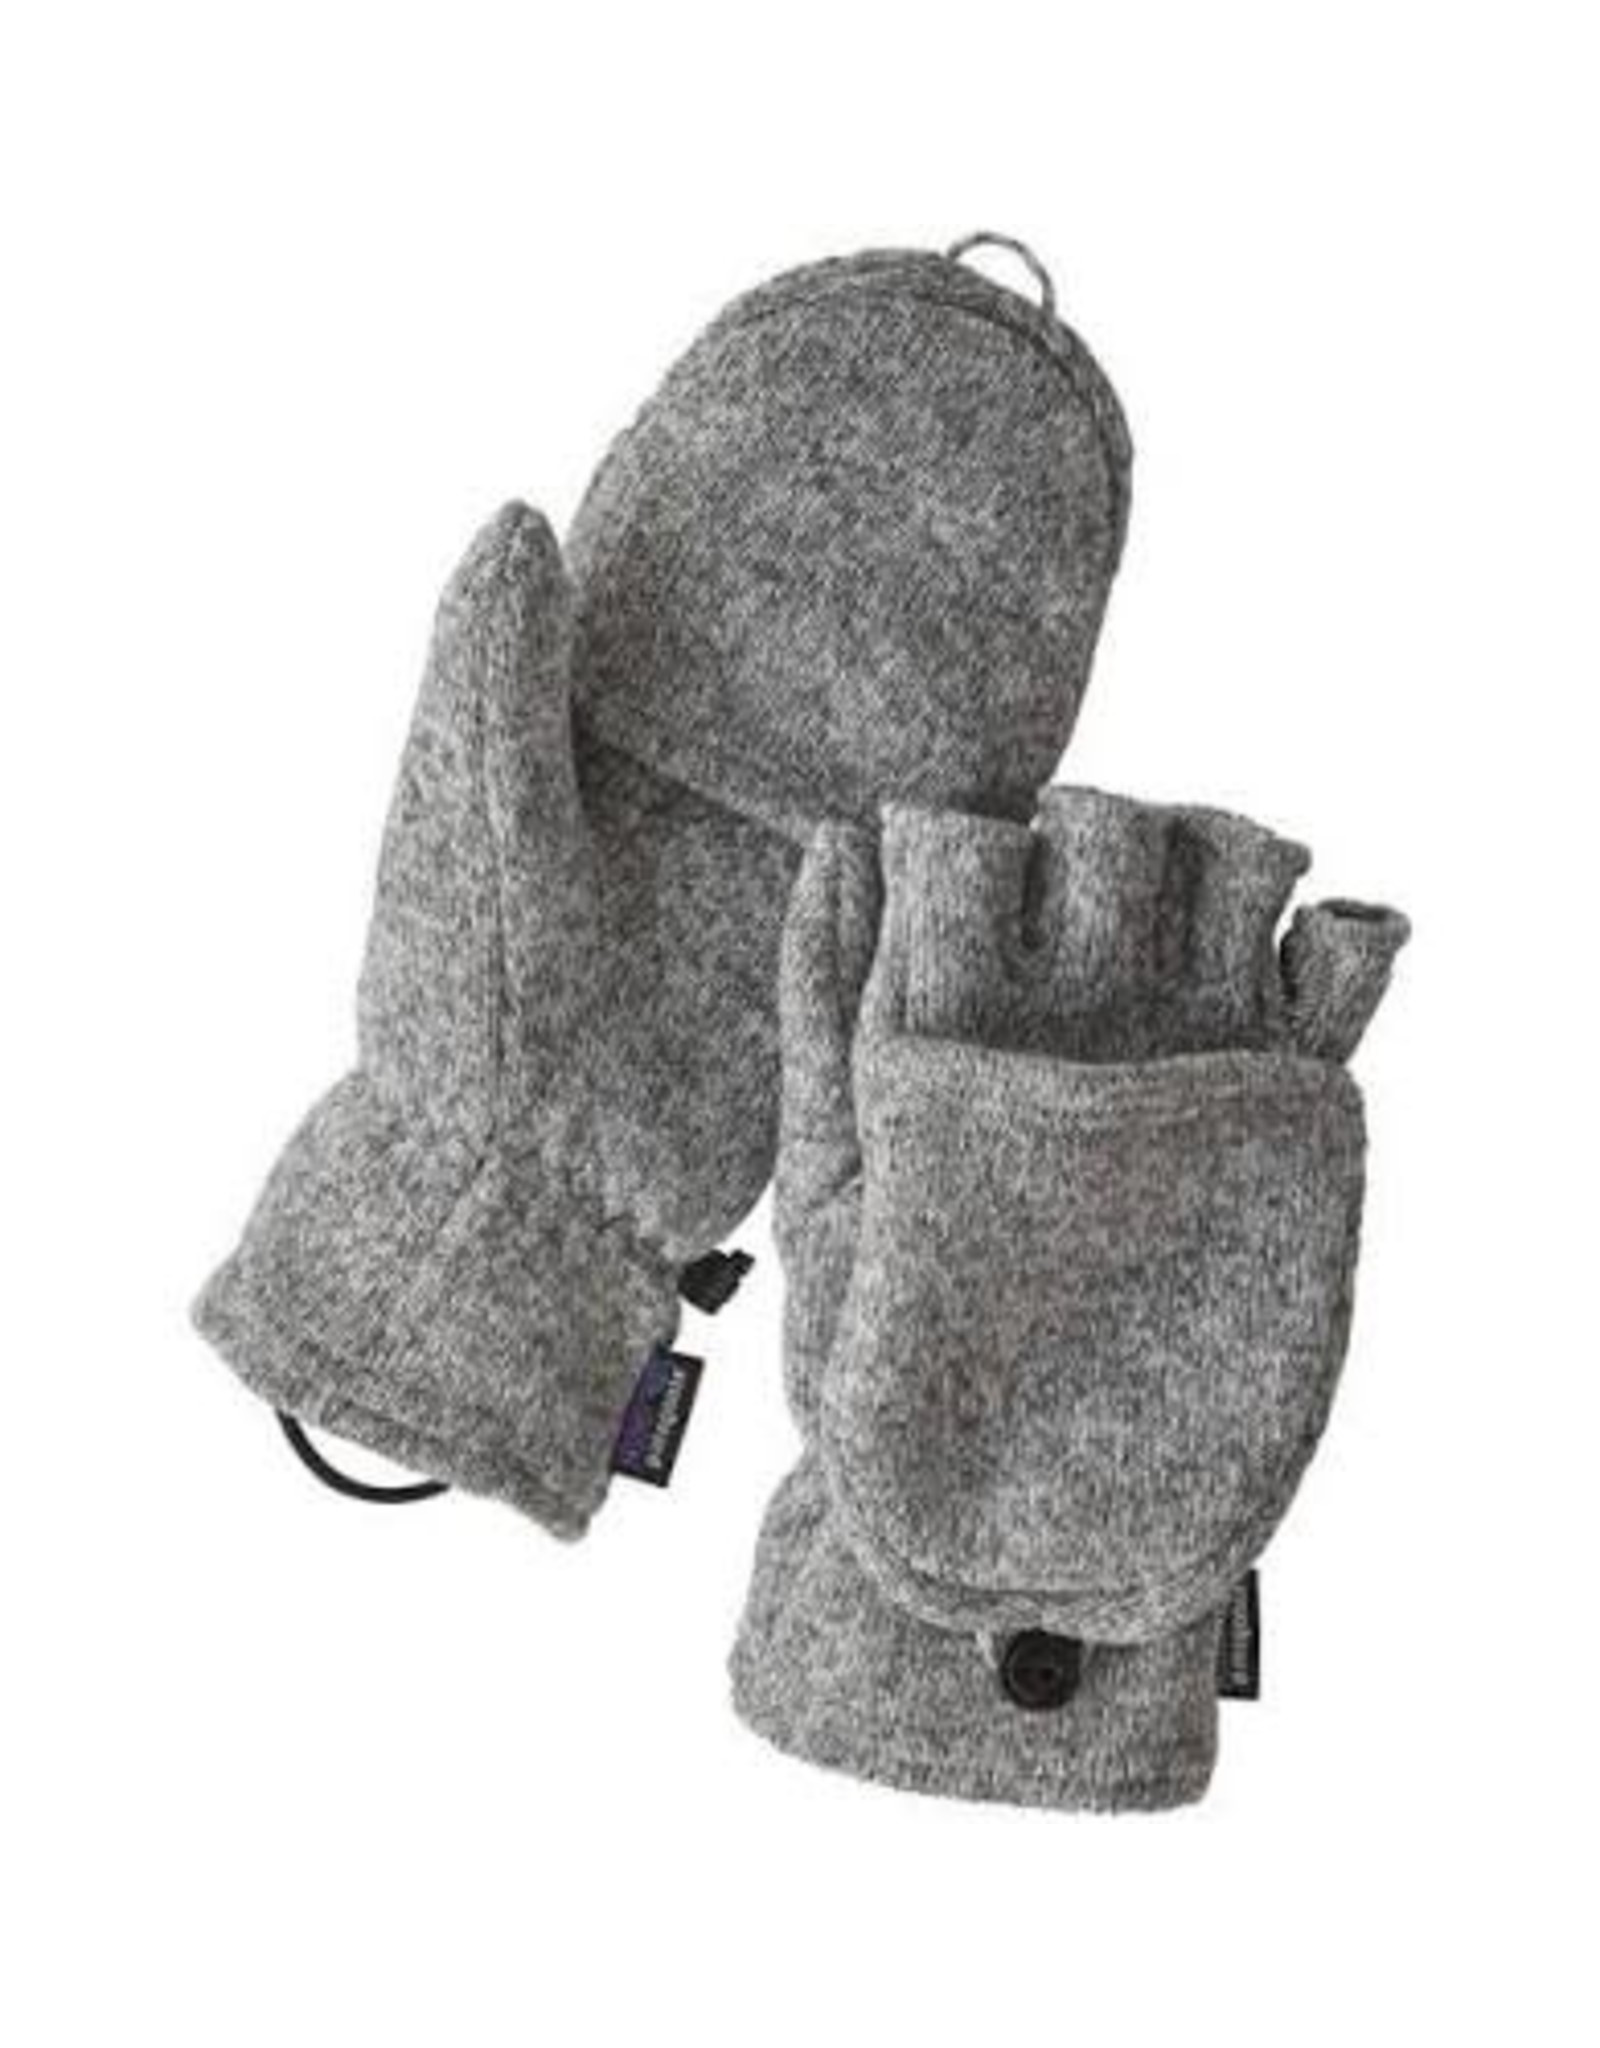 Patagonia Patagonia Better Sweater Gloves